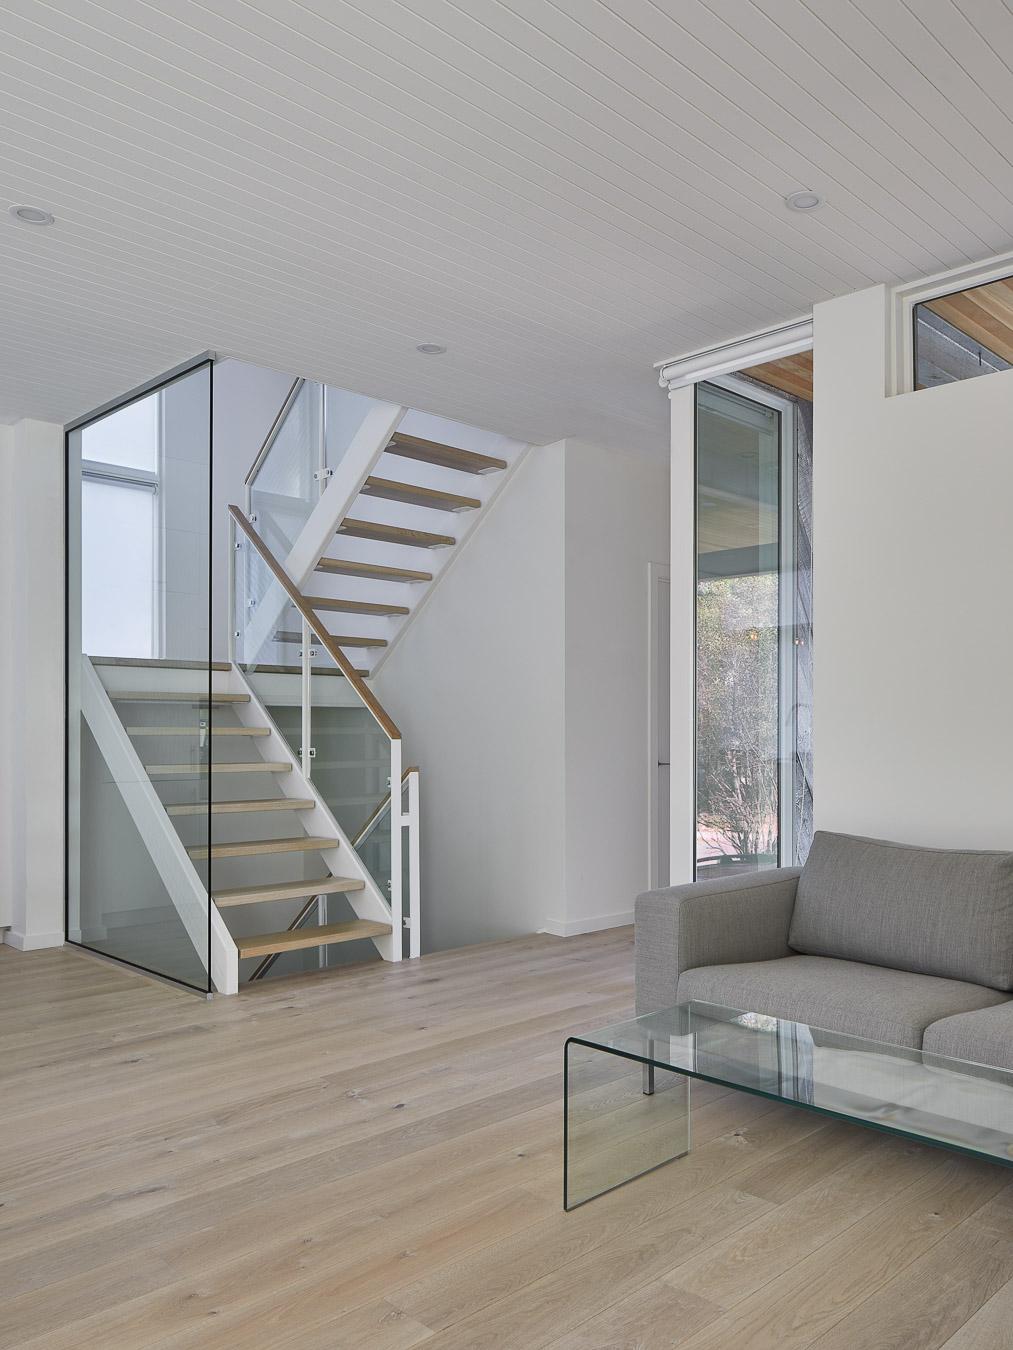 023-Shean Architects Fentiman.jpg